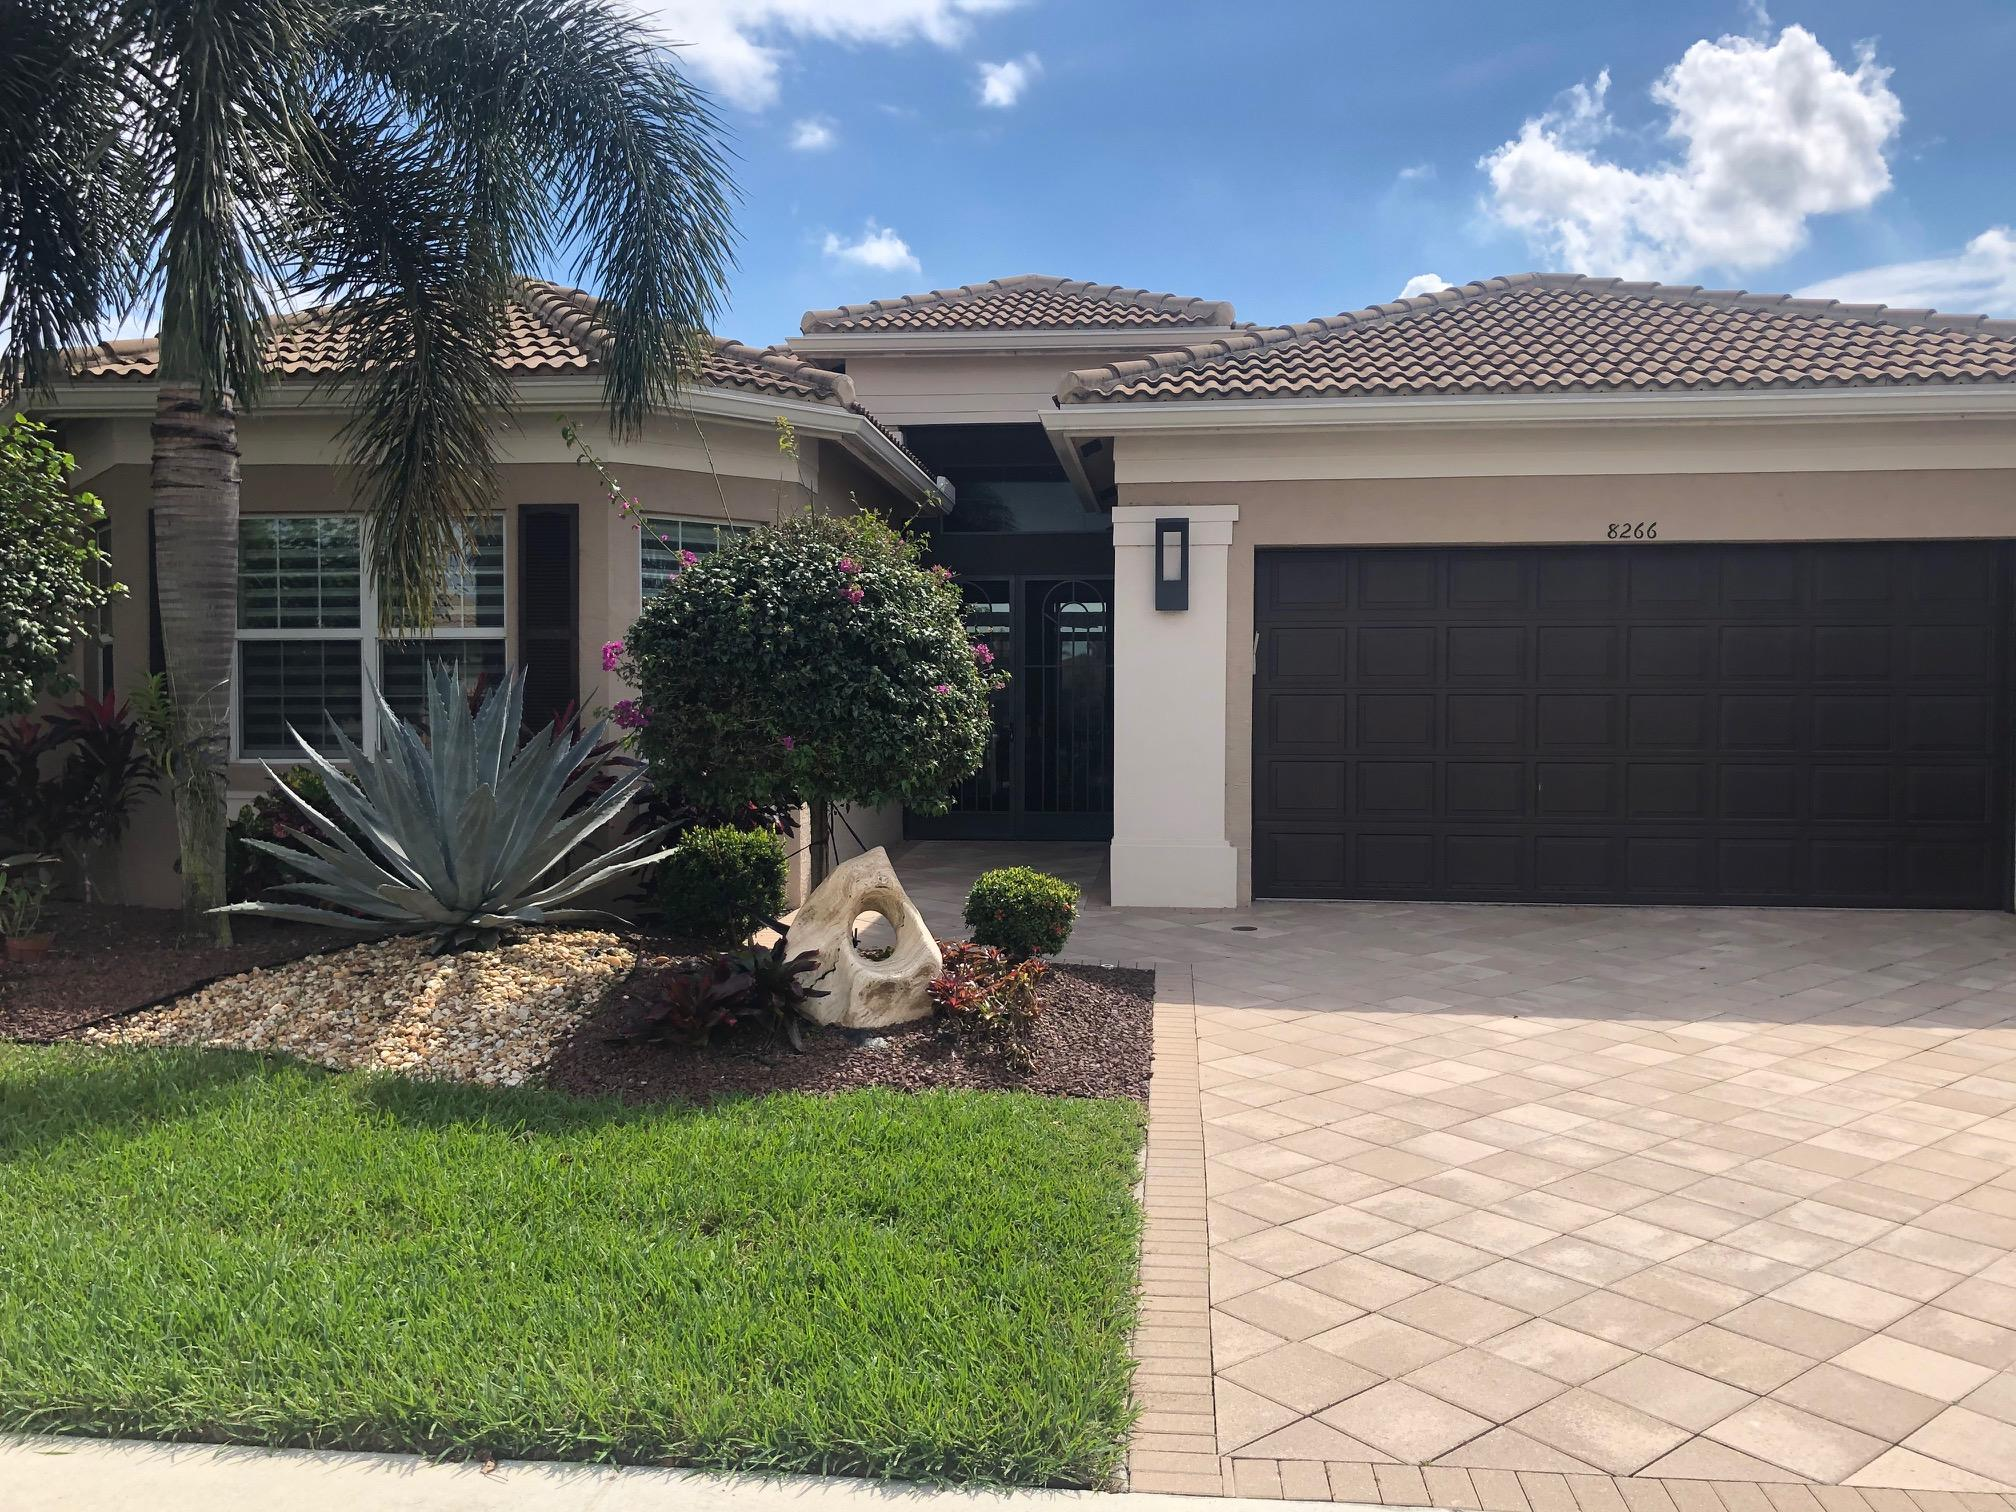 8266  Razorback Court  For Sale 10694620, FL